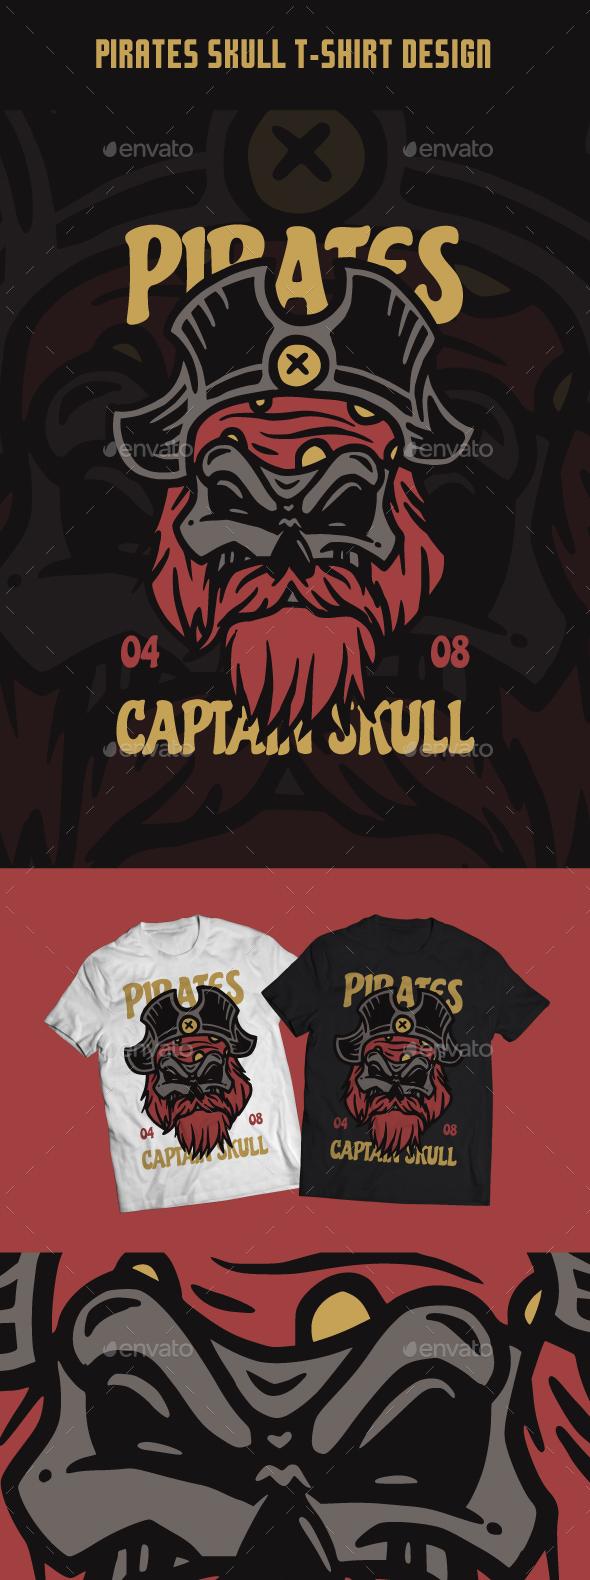 Pirates Skull T-Shirt Design